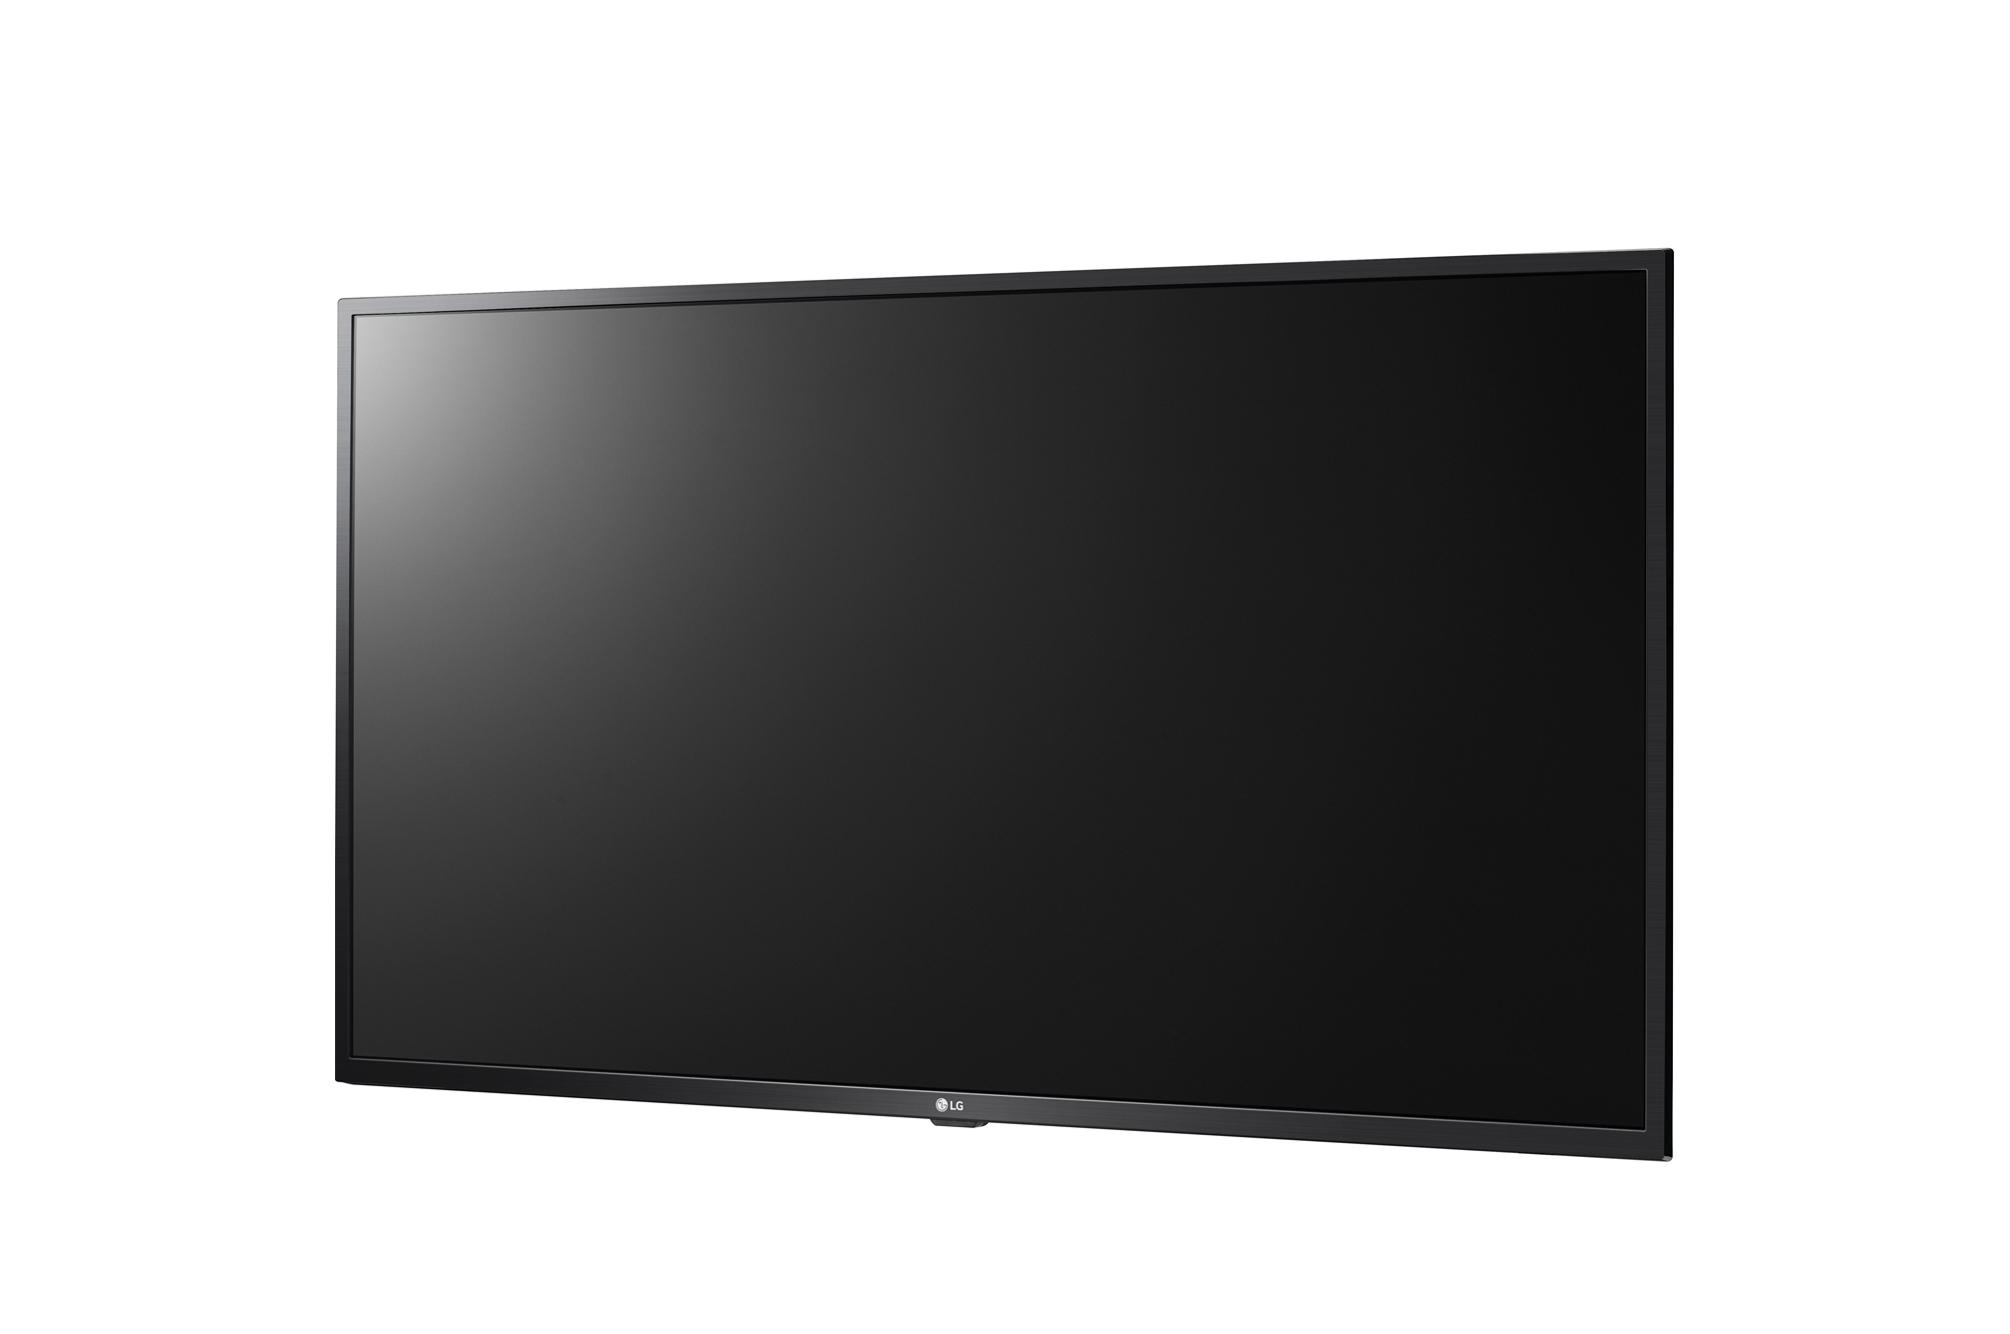 LG Hotel TV 50US662H (CIS) 3